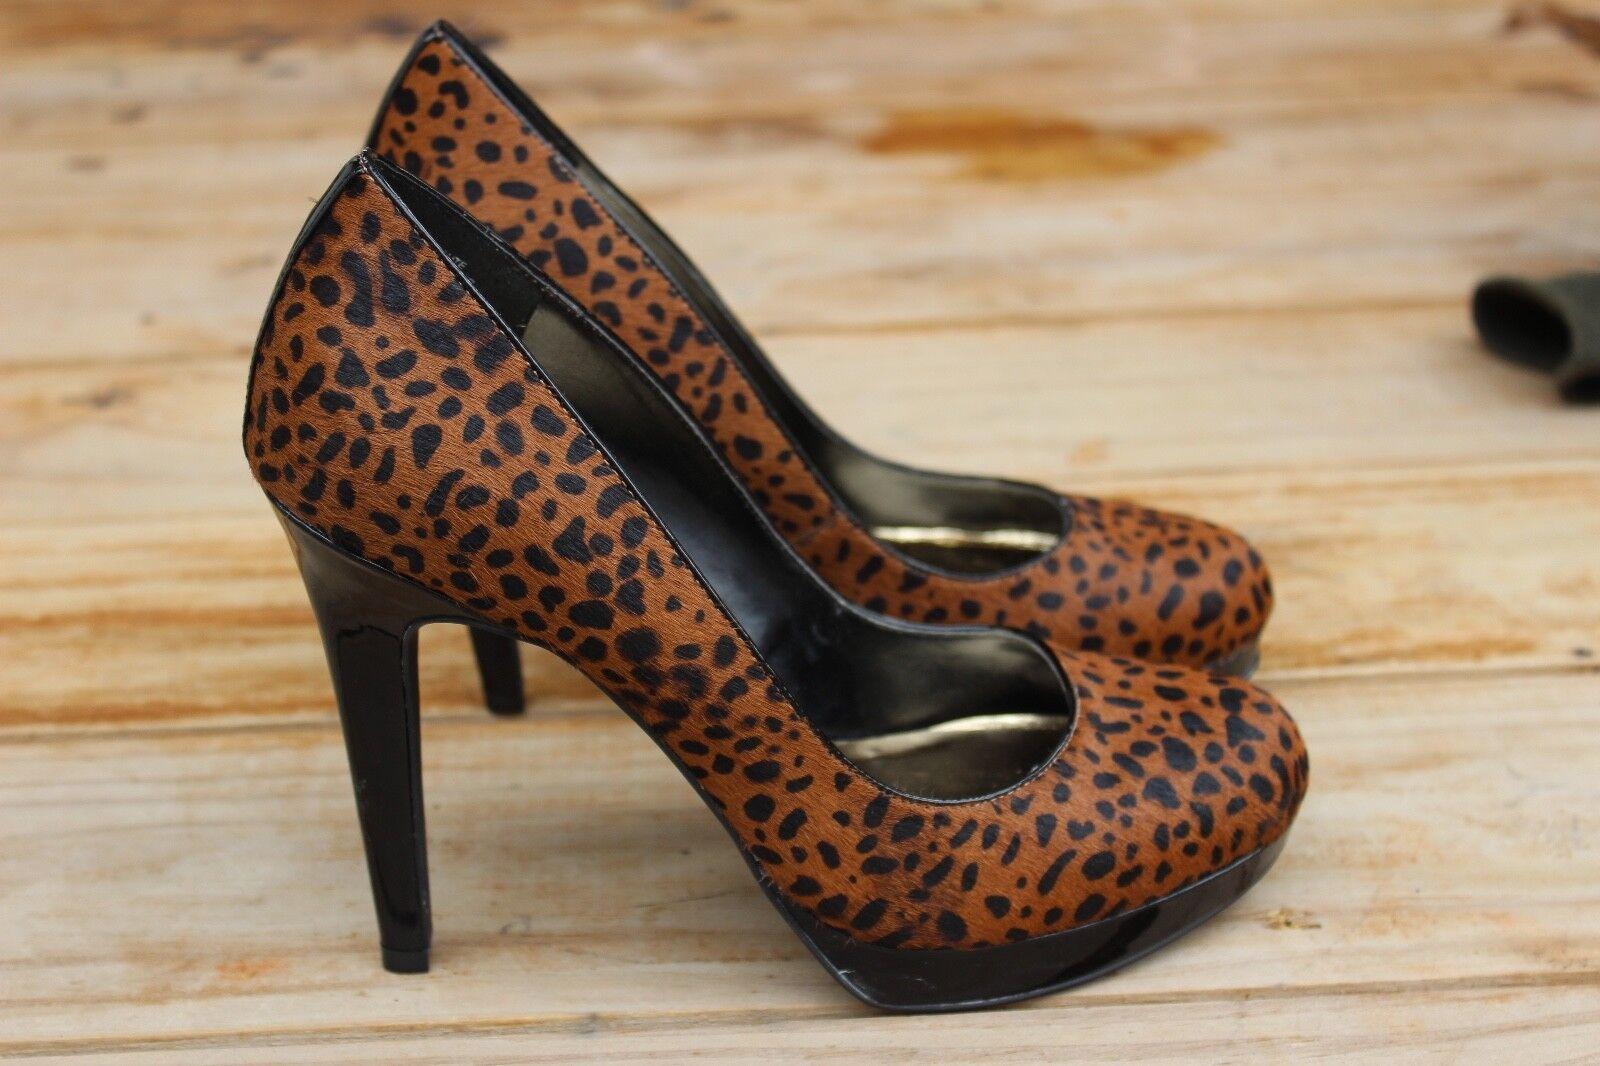 VIA blackLI Women's Leopard Print Calf Hair Leather Platform Pump 10M